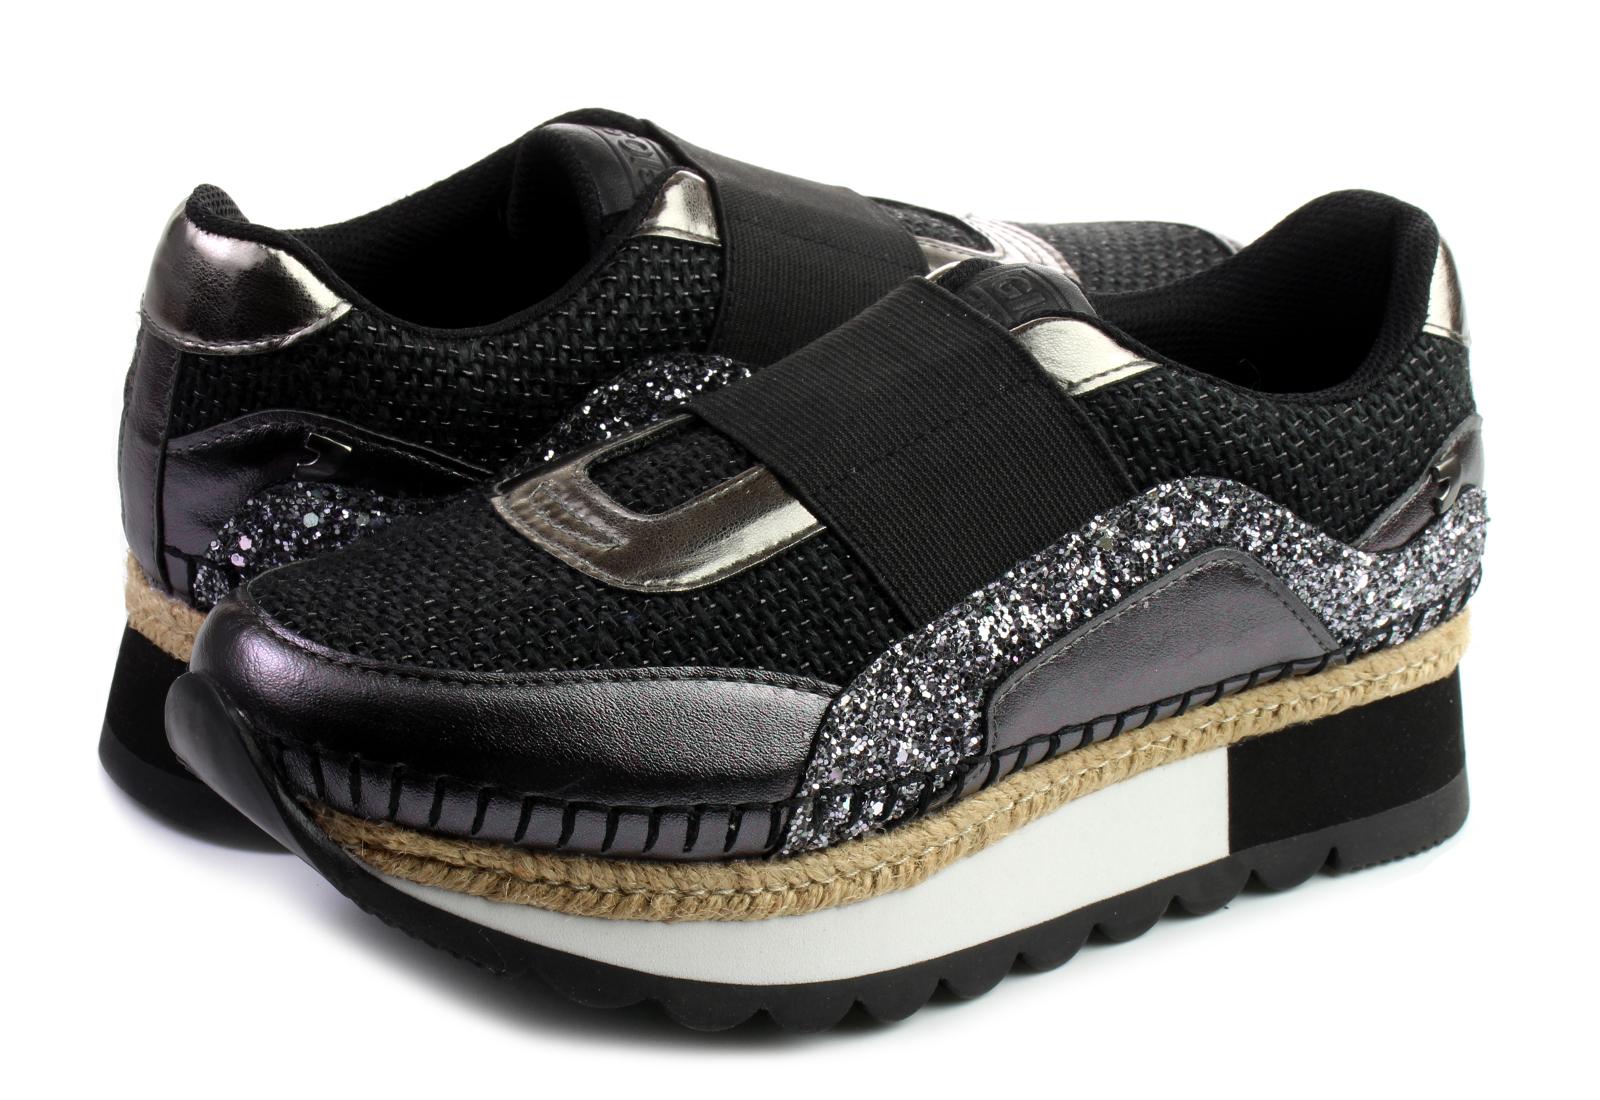 43399_Gioseppo Cipő - 43399 - 43399-blk - Office Shoes Magyarország